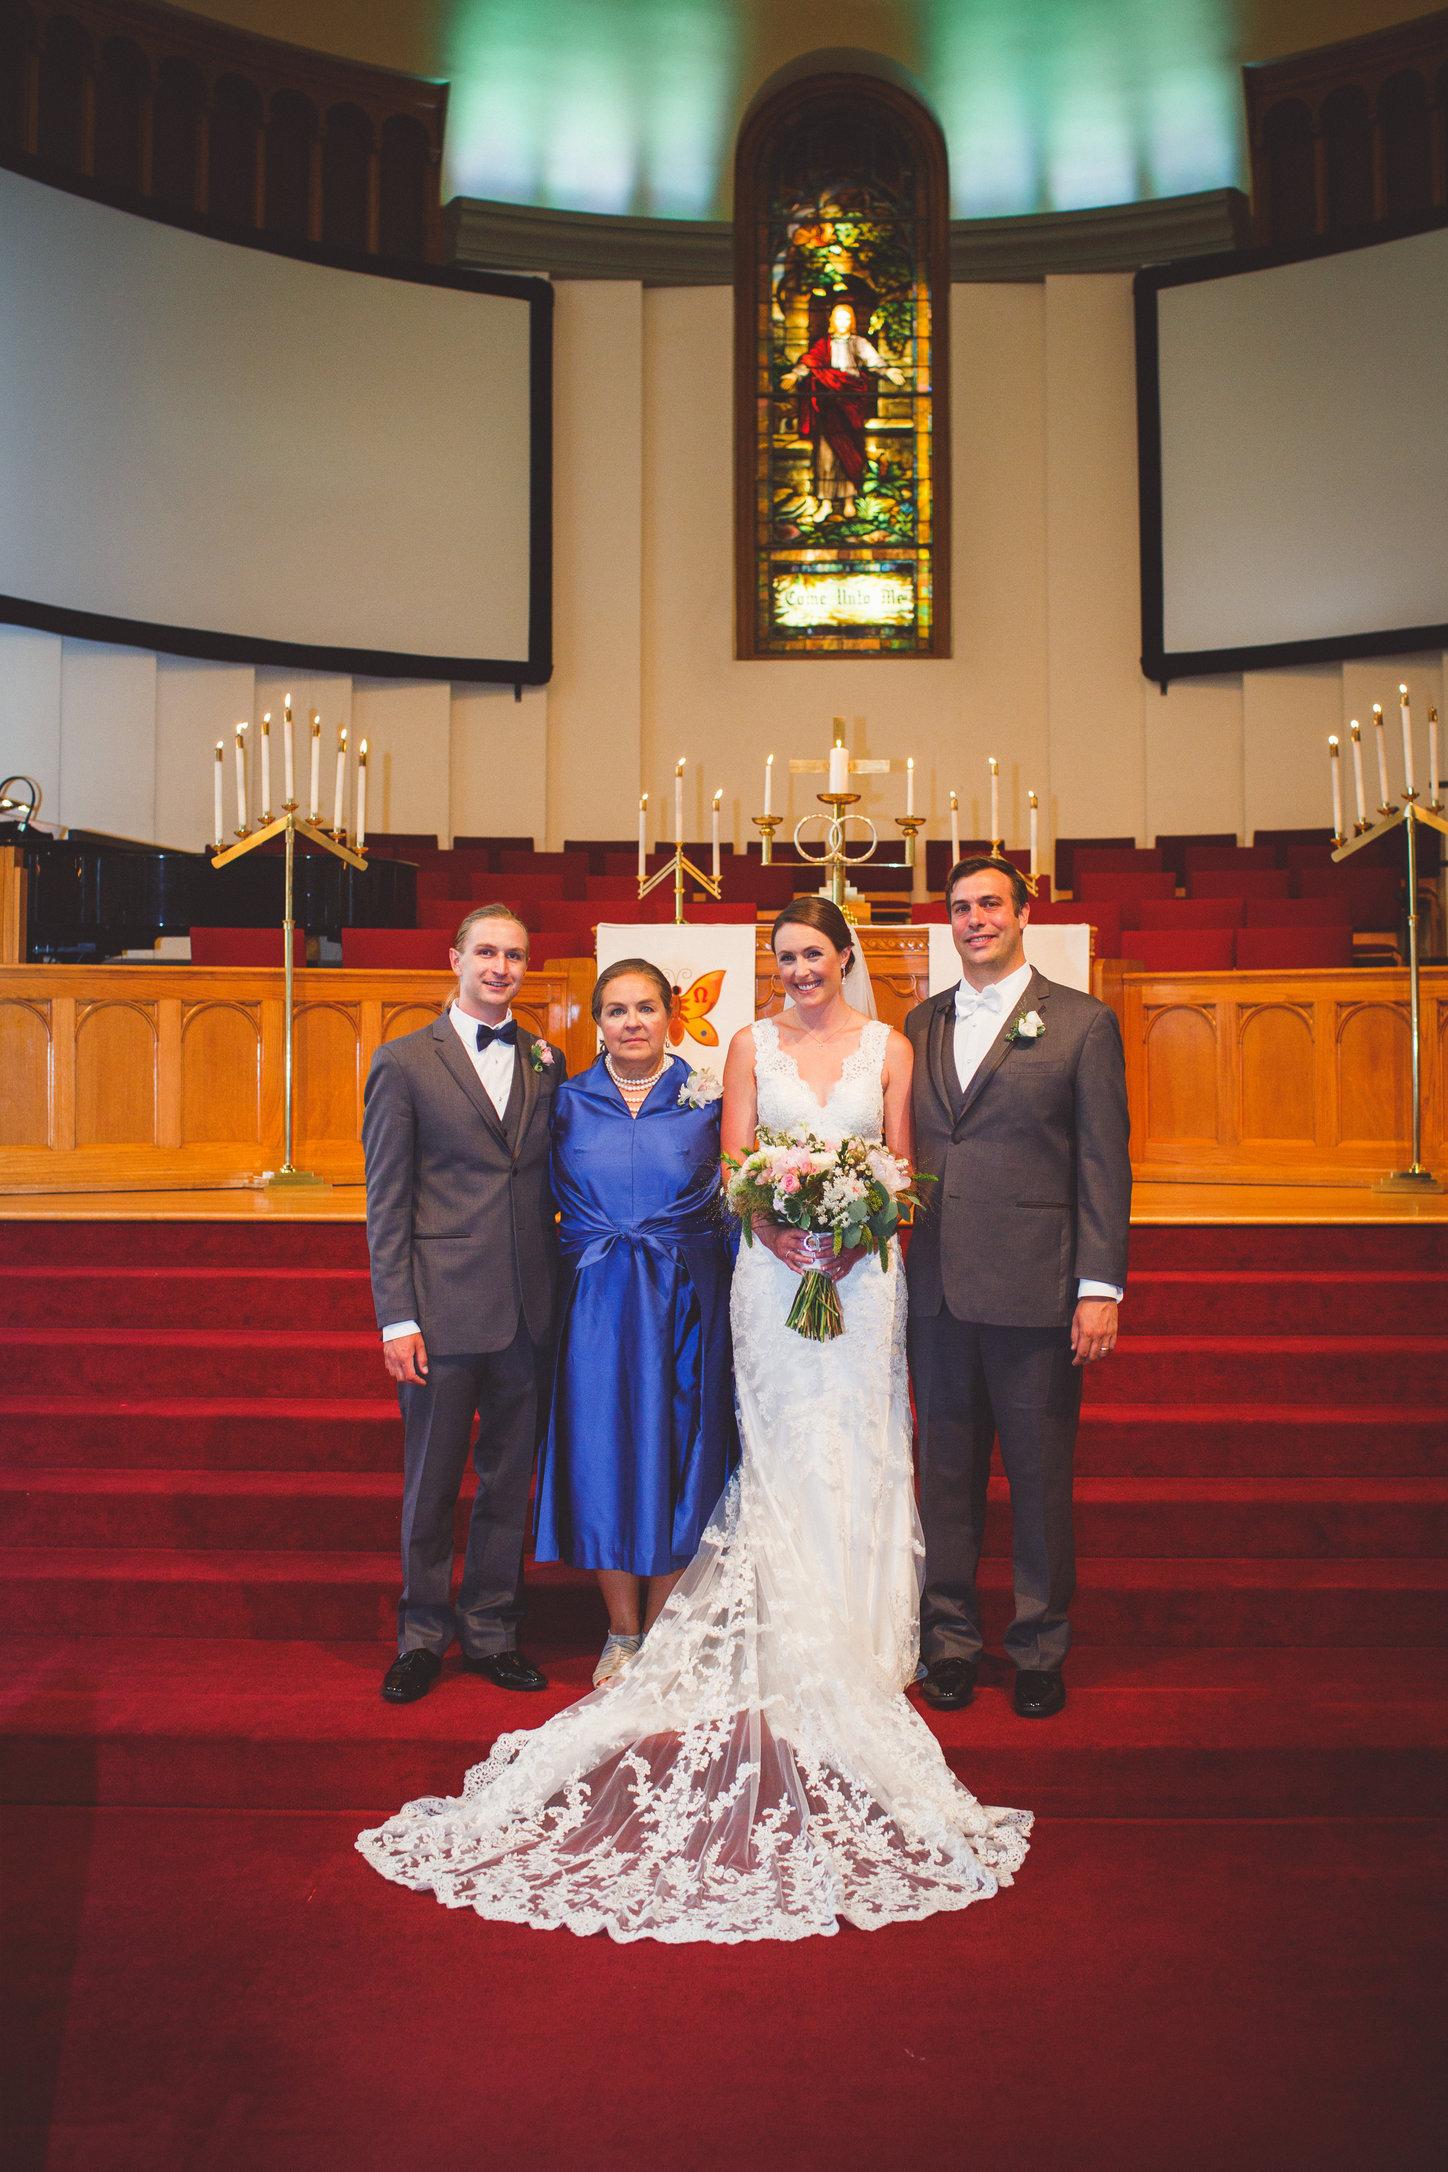 SandC-wedding-263.jpg